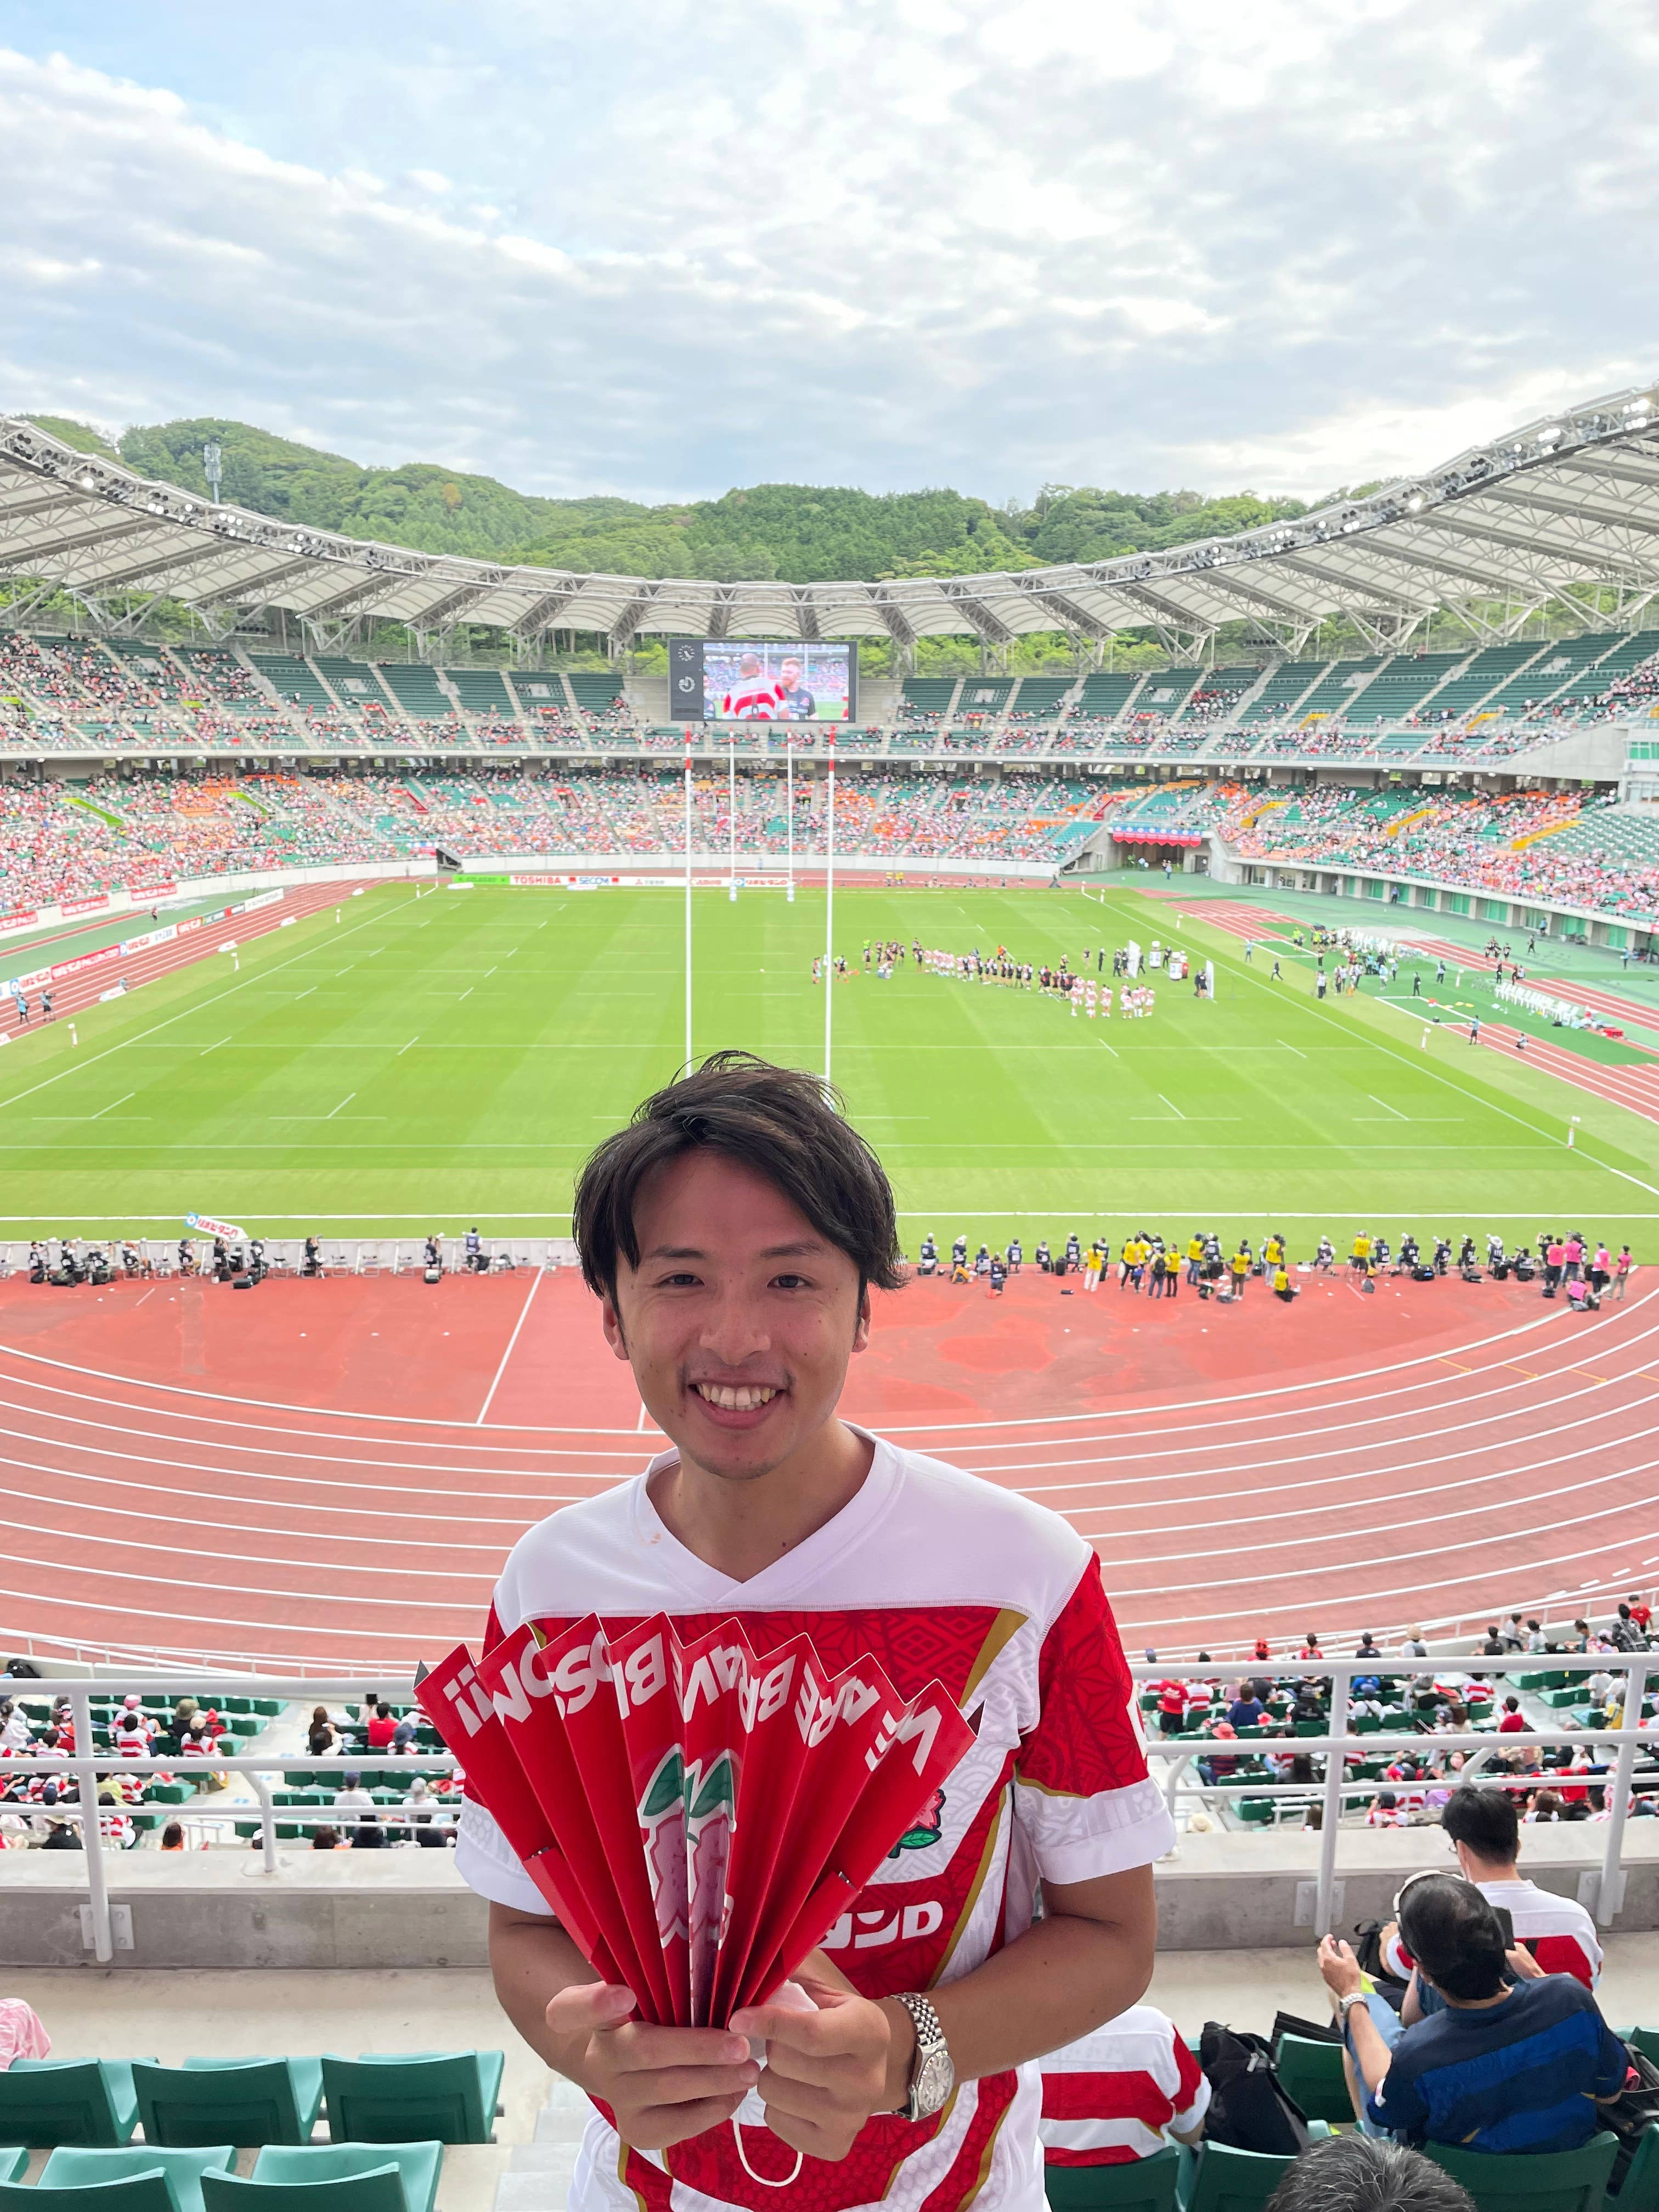 iwase yoshihiro